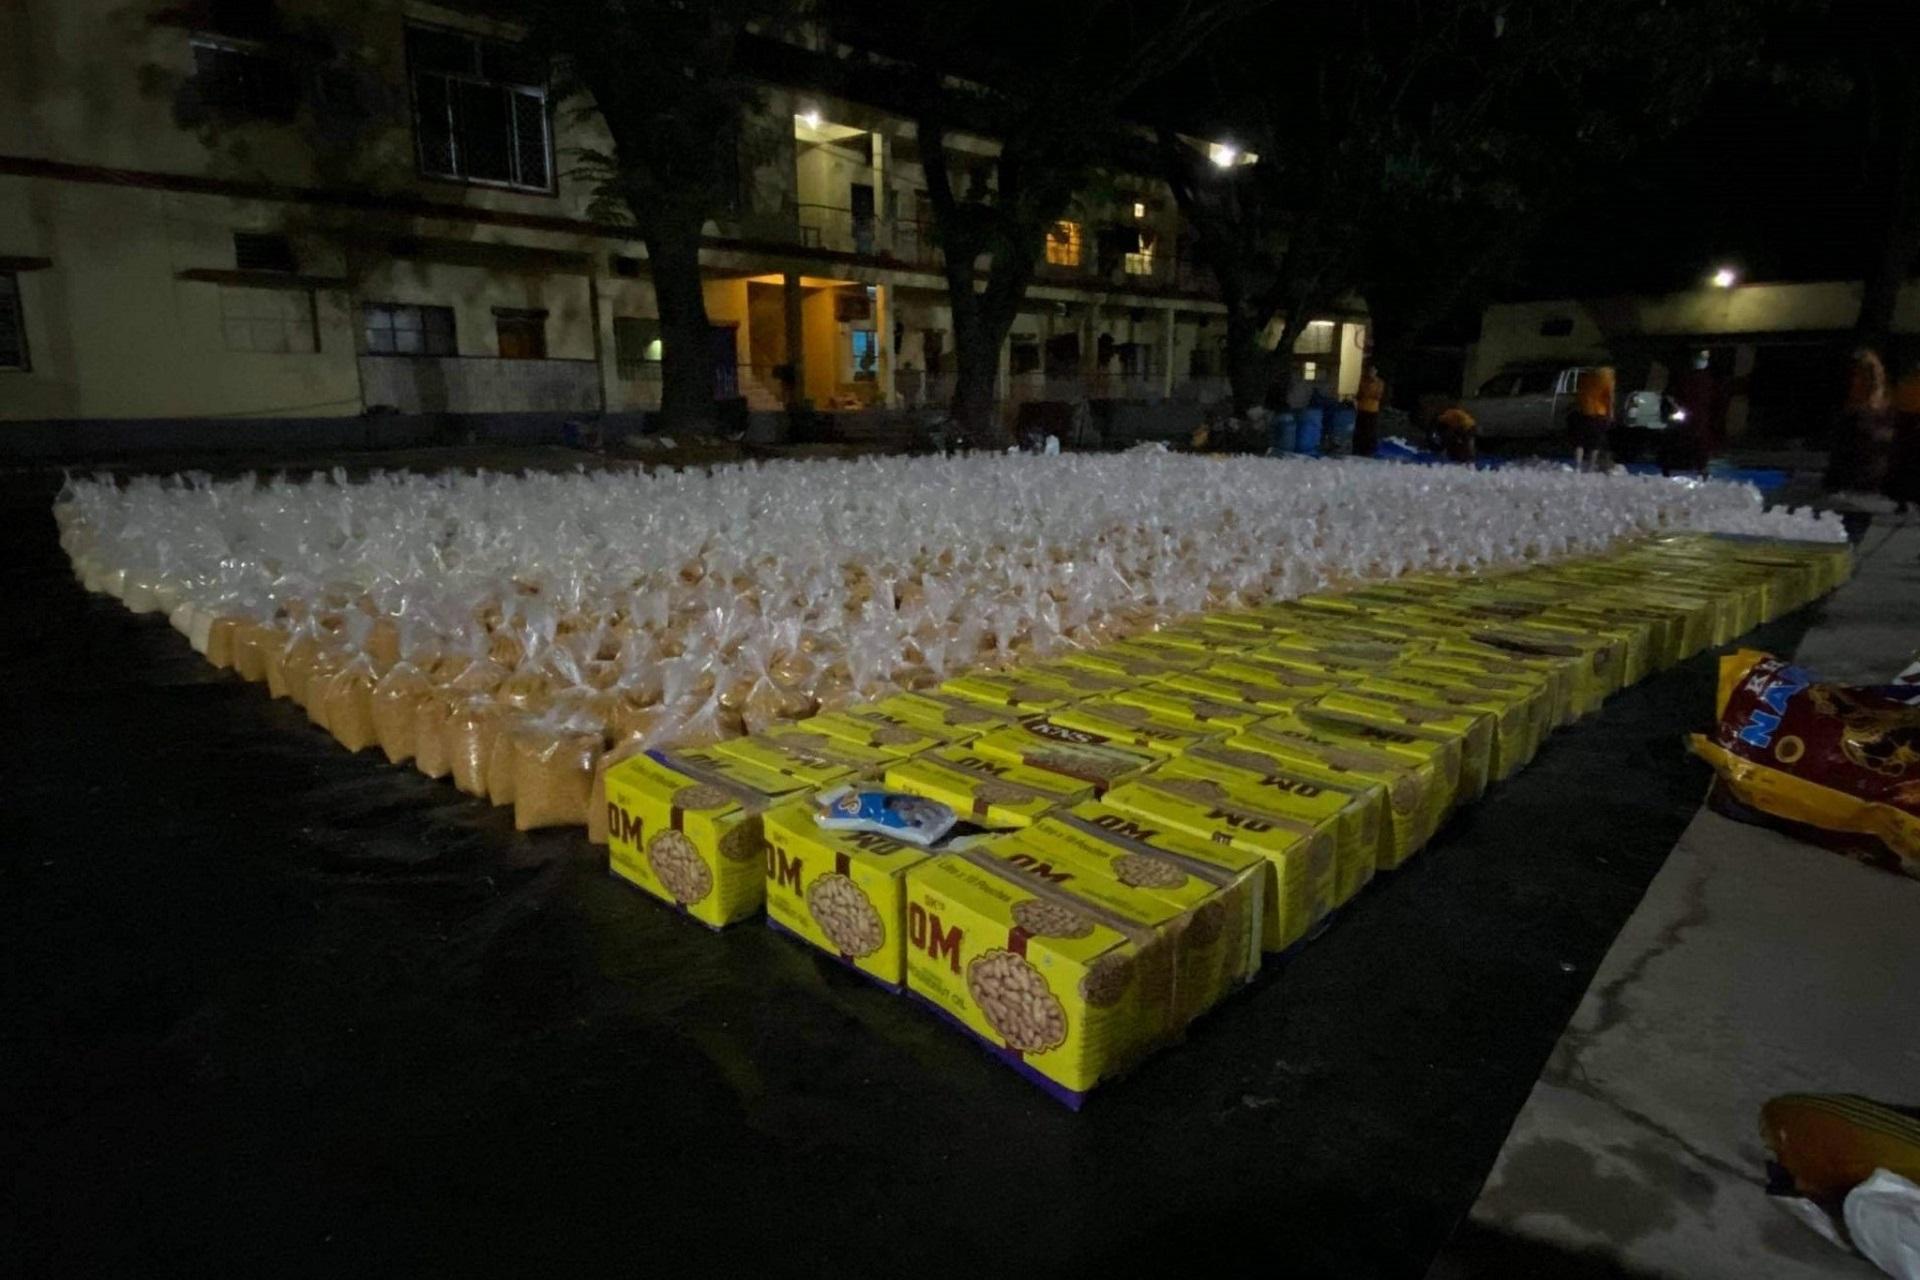 Pachete de alimente pregătite de distribuire